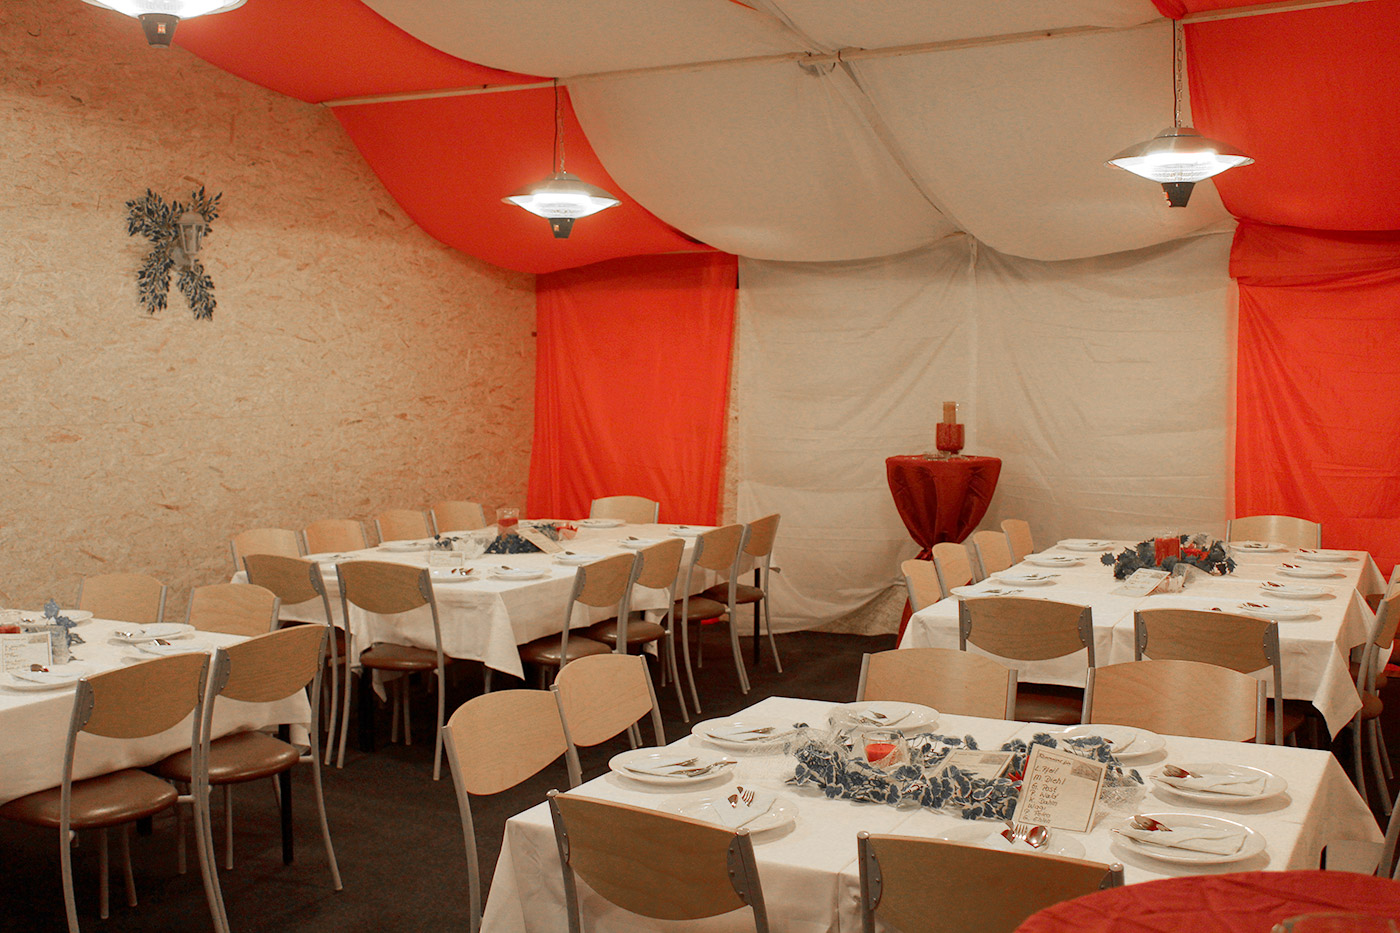 Pavillon festlich Gasthaus En d'r Burg